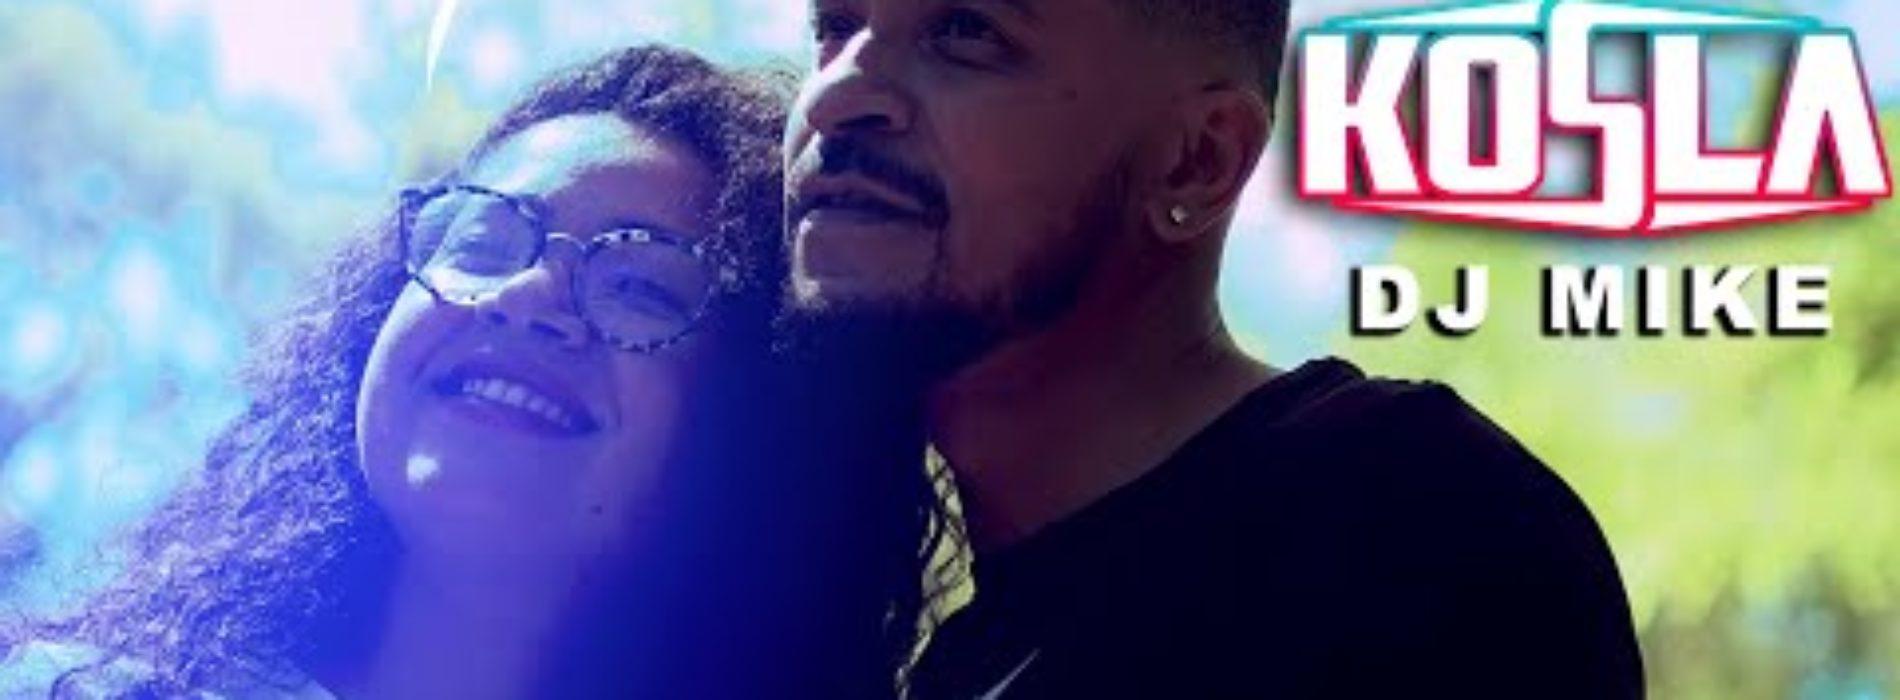 Son 974 – KOSLA FT. DJ MIKE – Sans toi (clip officiel) – Octobre 2020